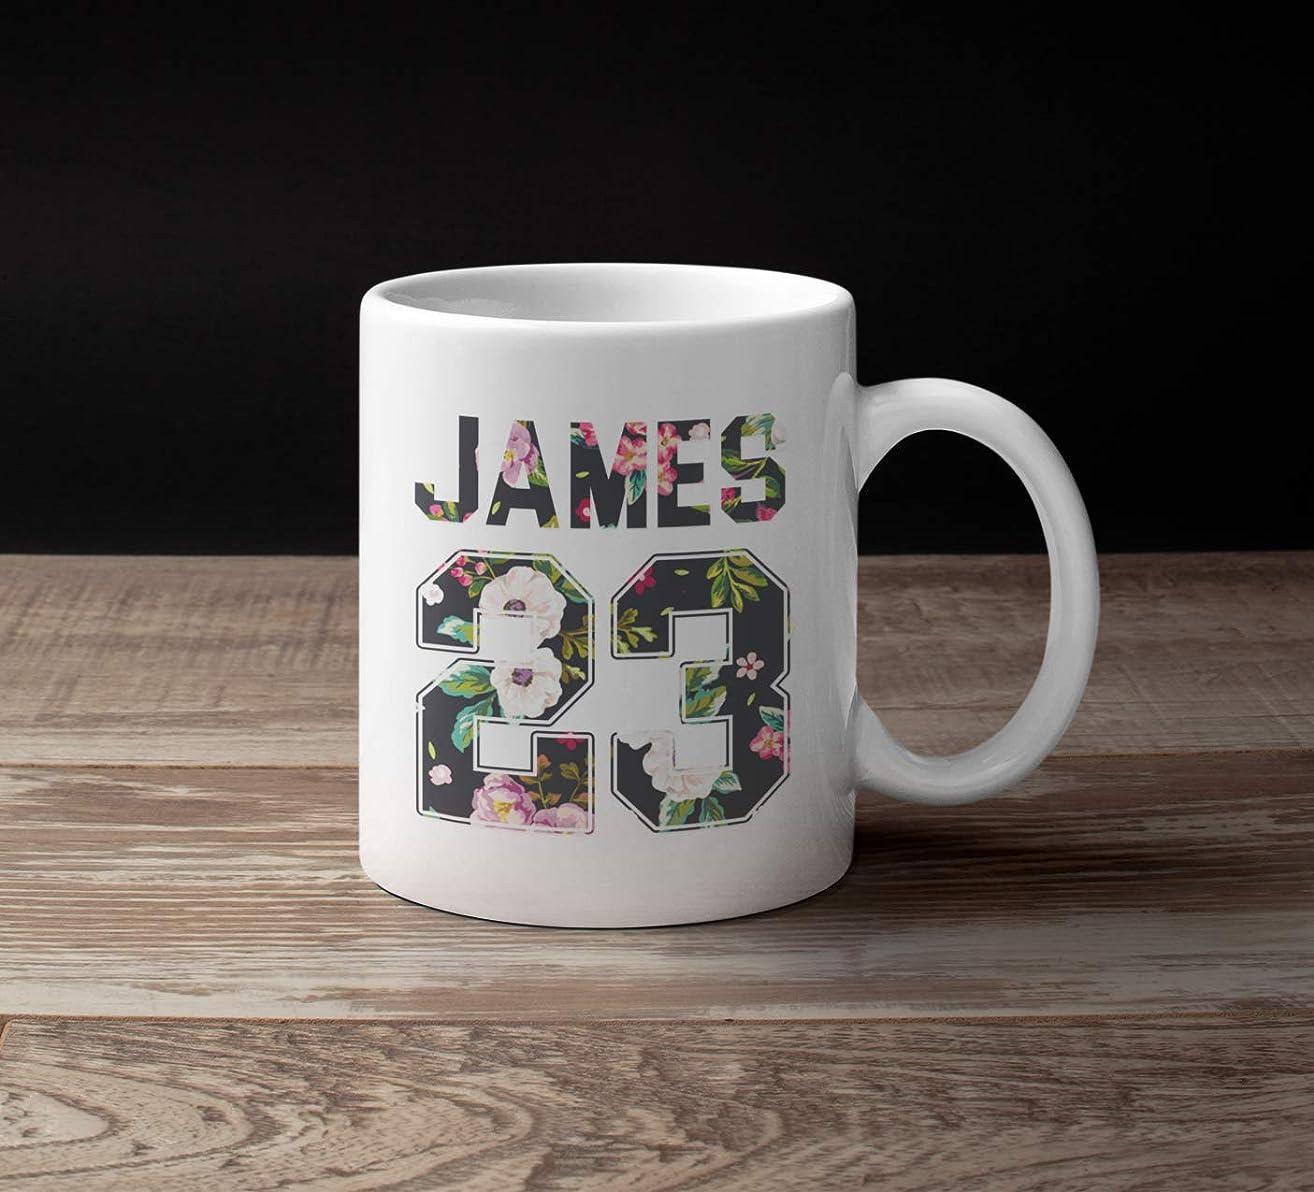 James-23 Mugs Basketball Los-Angeles Jersey Big Gift Fan Customized Handmade 11oz Accent Mug/Black Mug/15oz White Mug